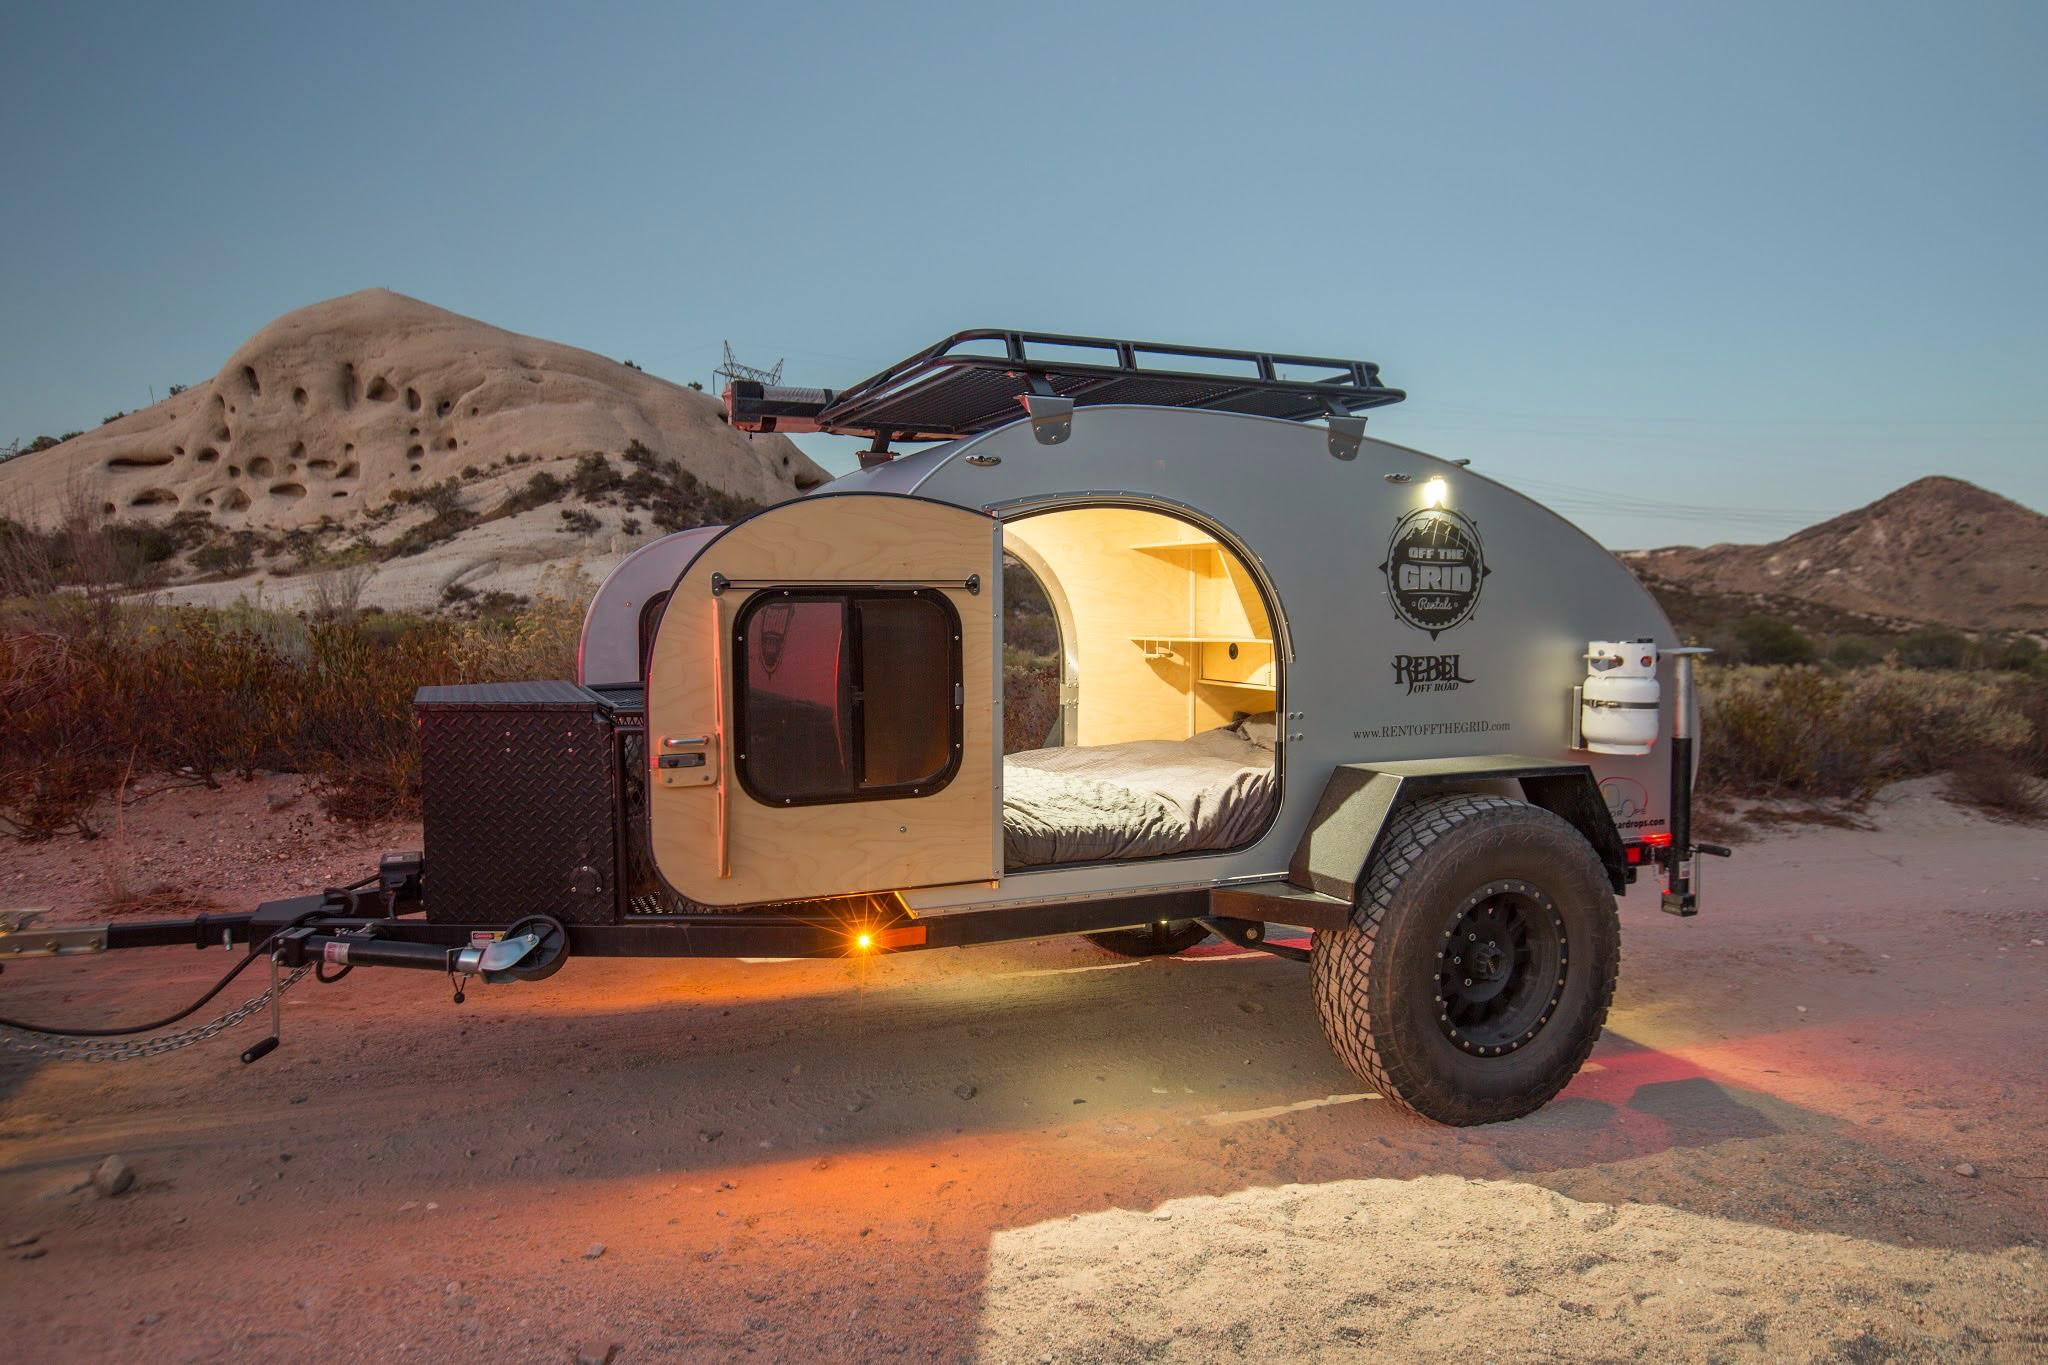 off road teardrop trailers off the grid rentals. Black Bedroom Furniture Sets. Home Design Ideas